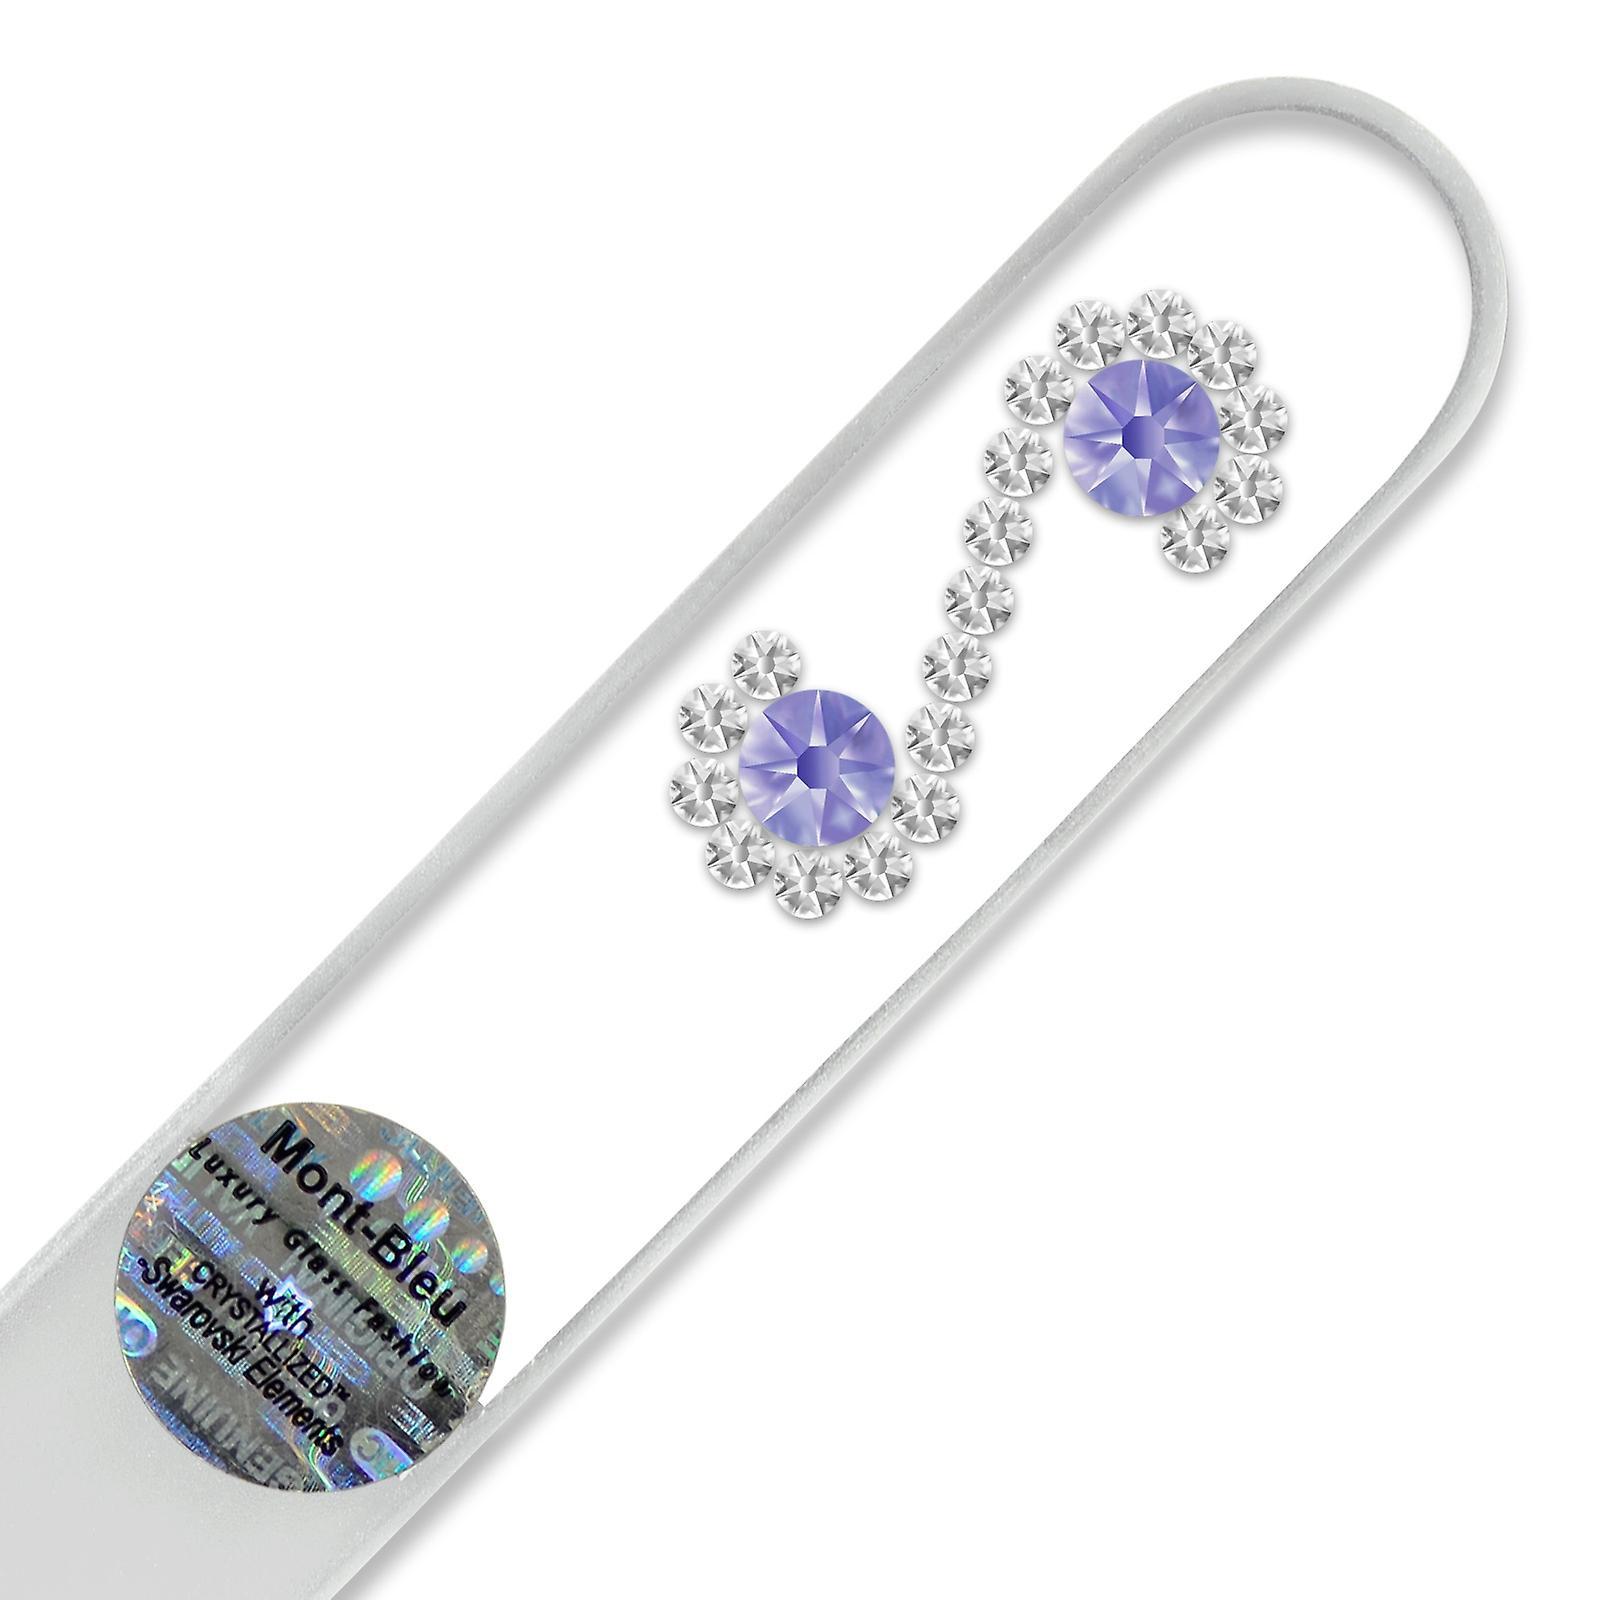 Mont Bleu Infinity Crystal Nail File LE-14